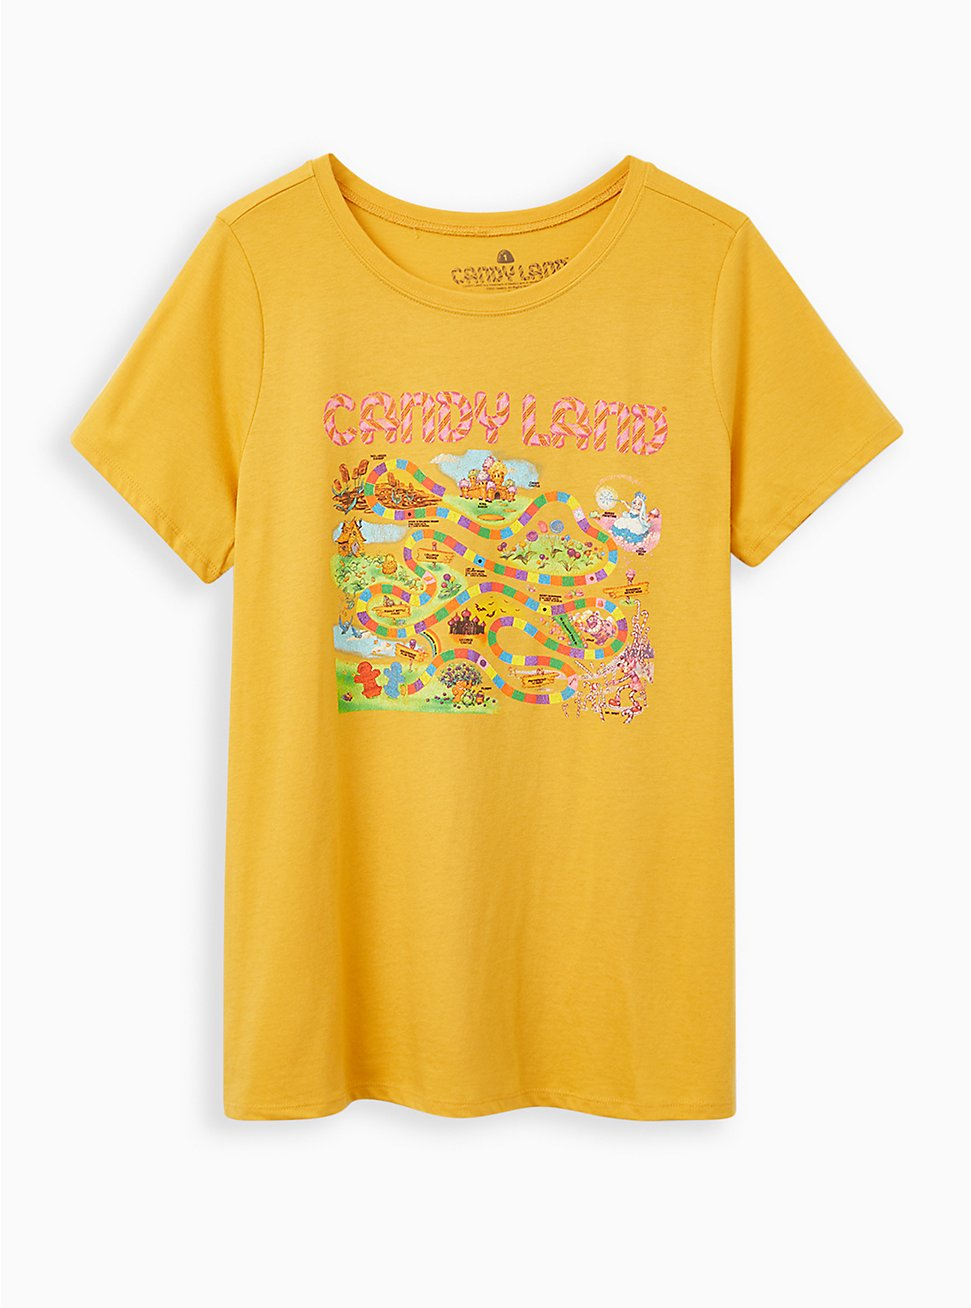 Slim Fit Crew Tee - Candyland Yellow, SUNDRESS, hi-res